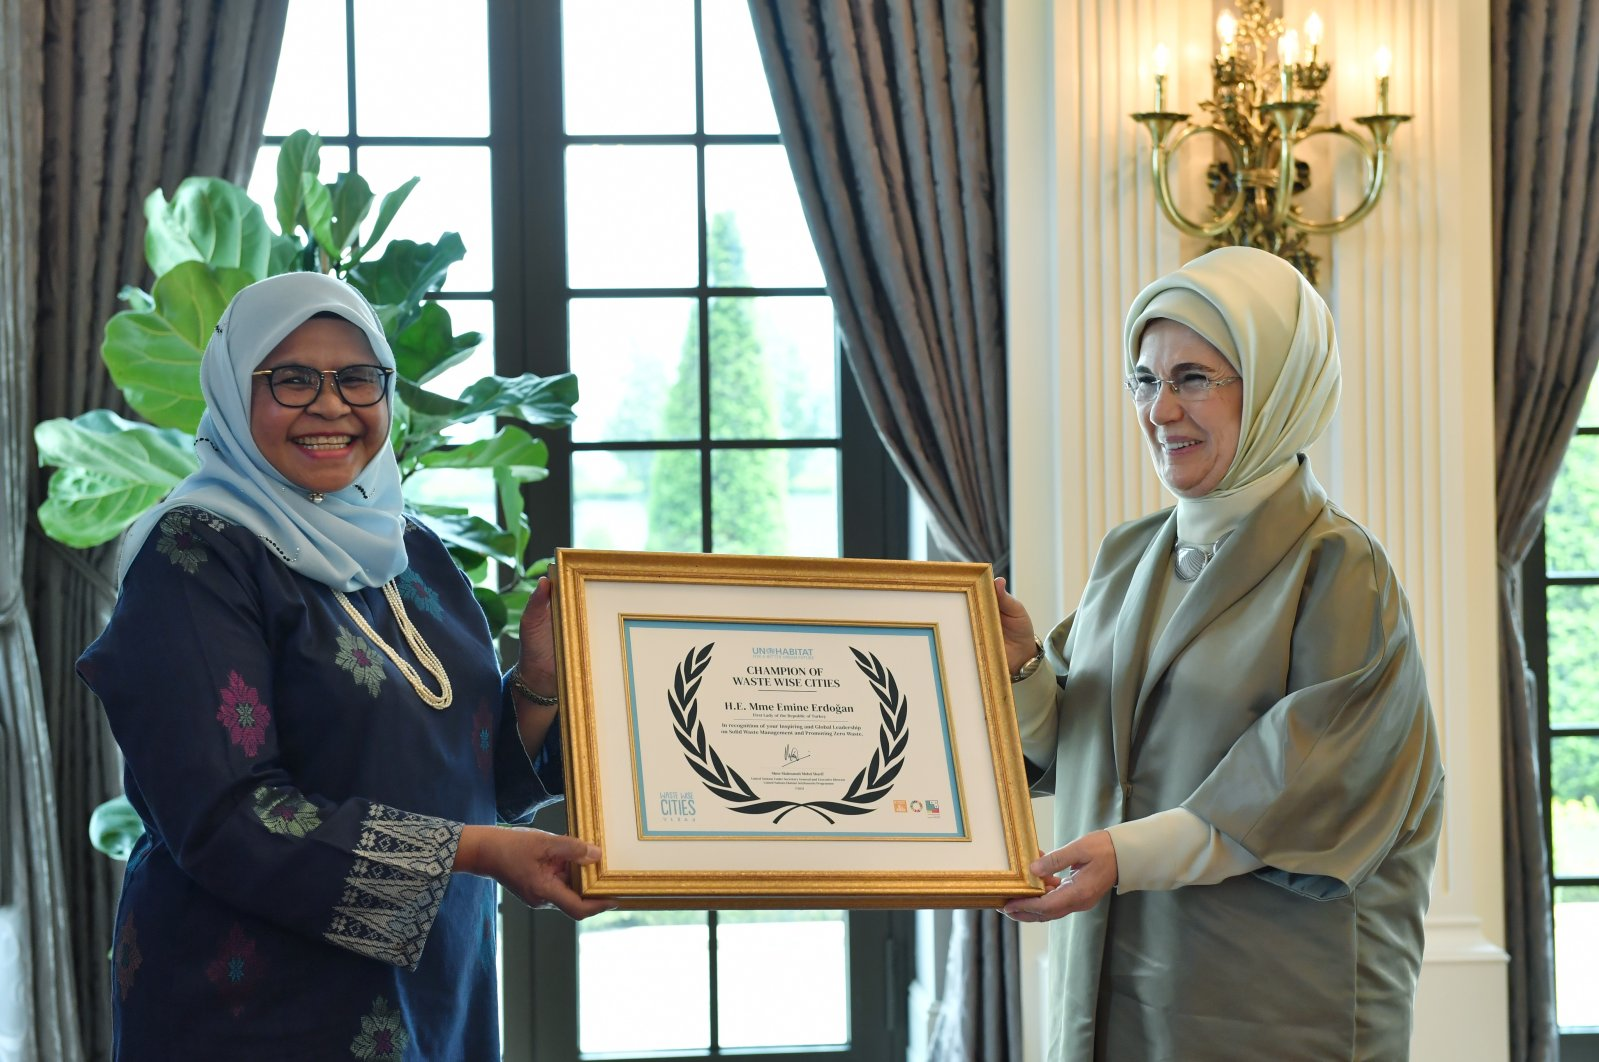 Executive Director of UN-Habitat Maimunah Mohd Sharif (L) presents First Lady Emine Erdoğan her award during a ceremony in the capital Ankara, Turkey, June 2, 2021. (AA Photo)